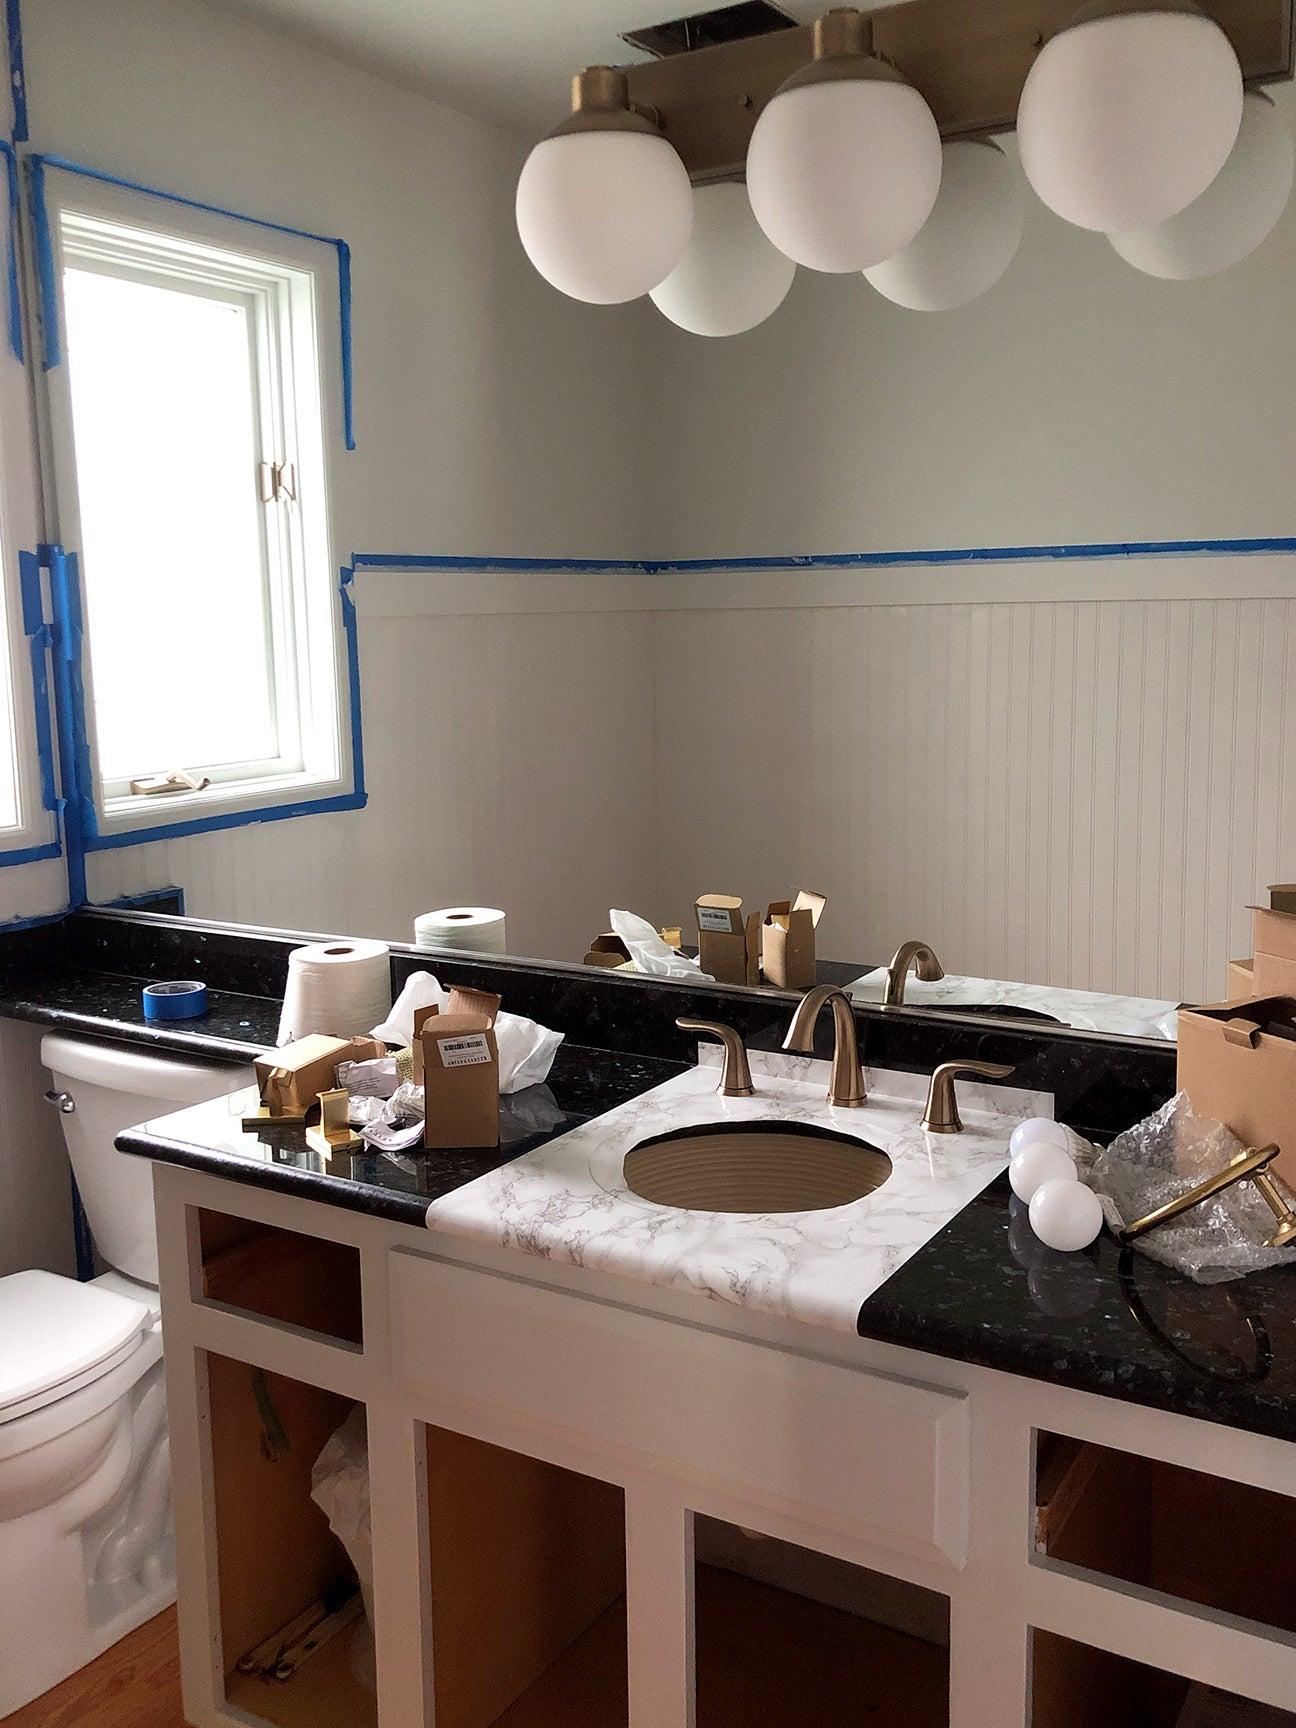 bathroom renovation process shot